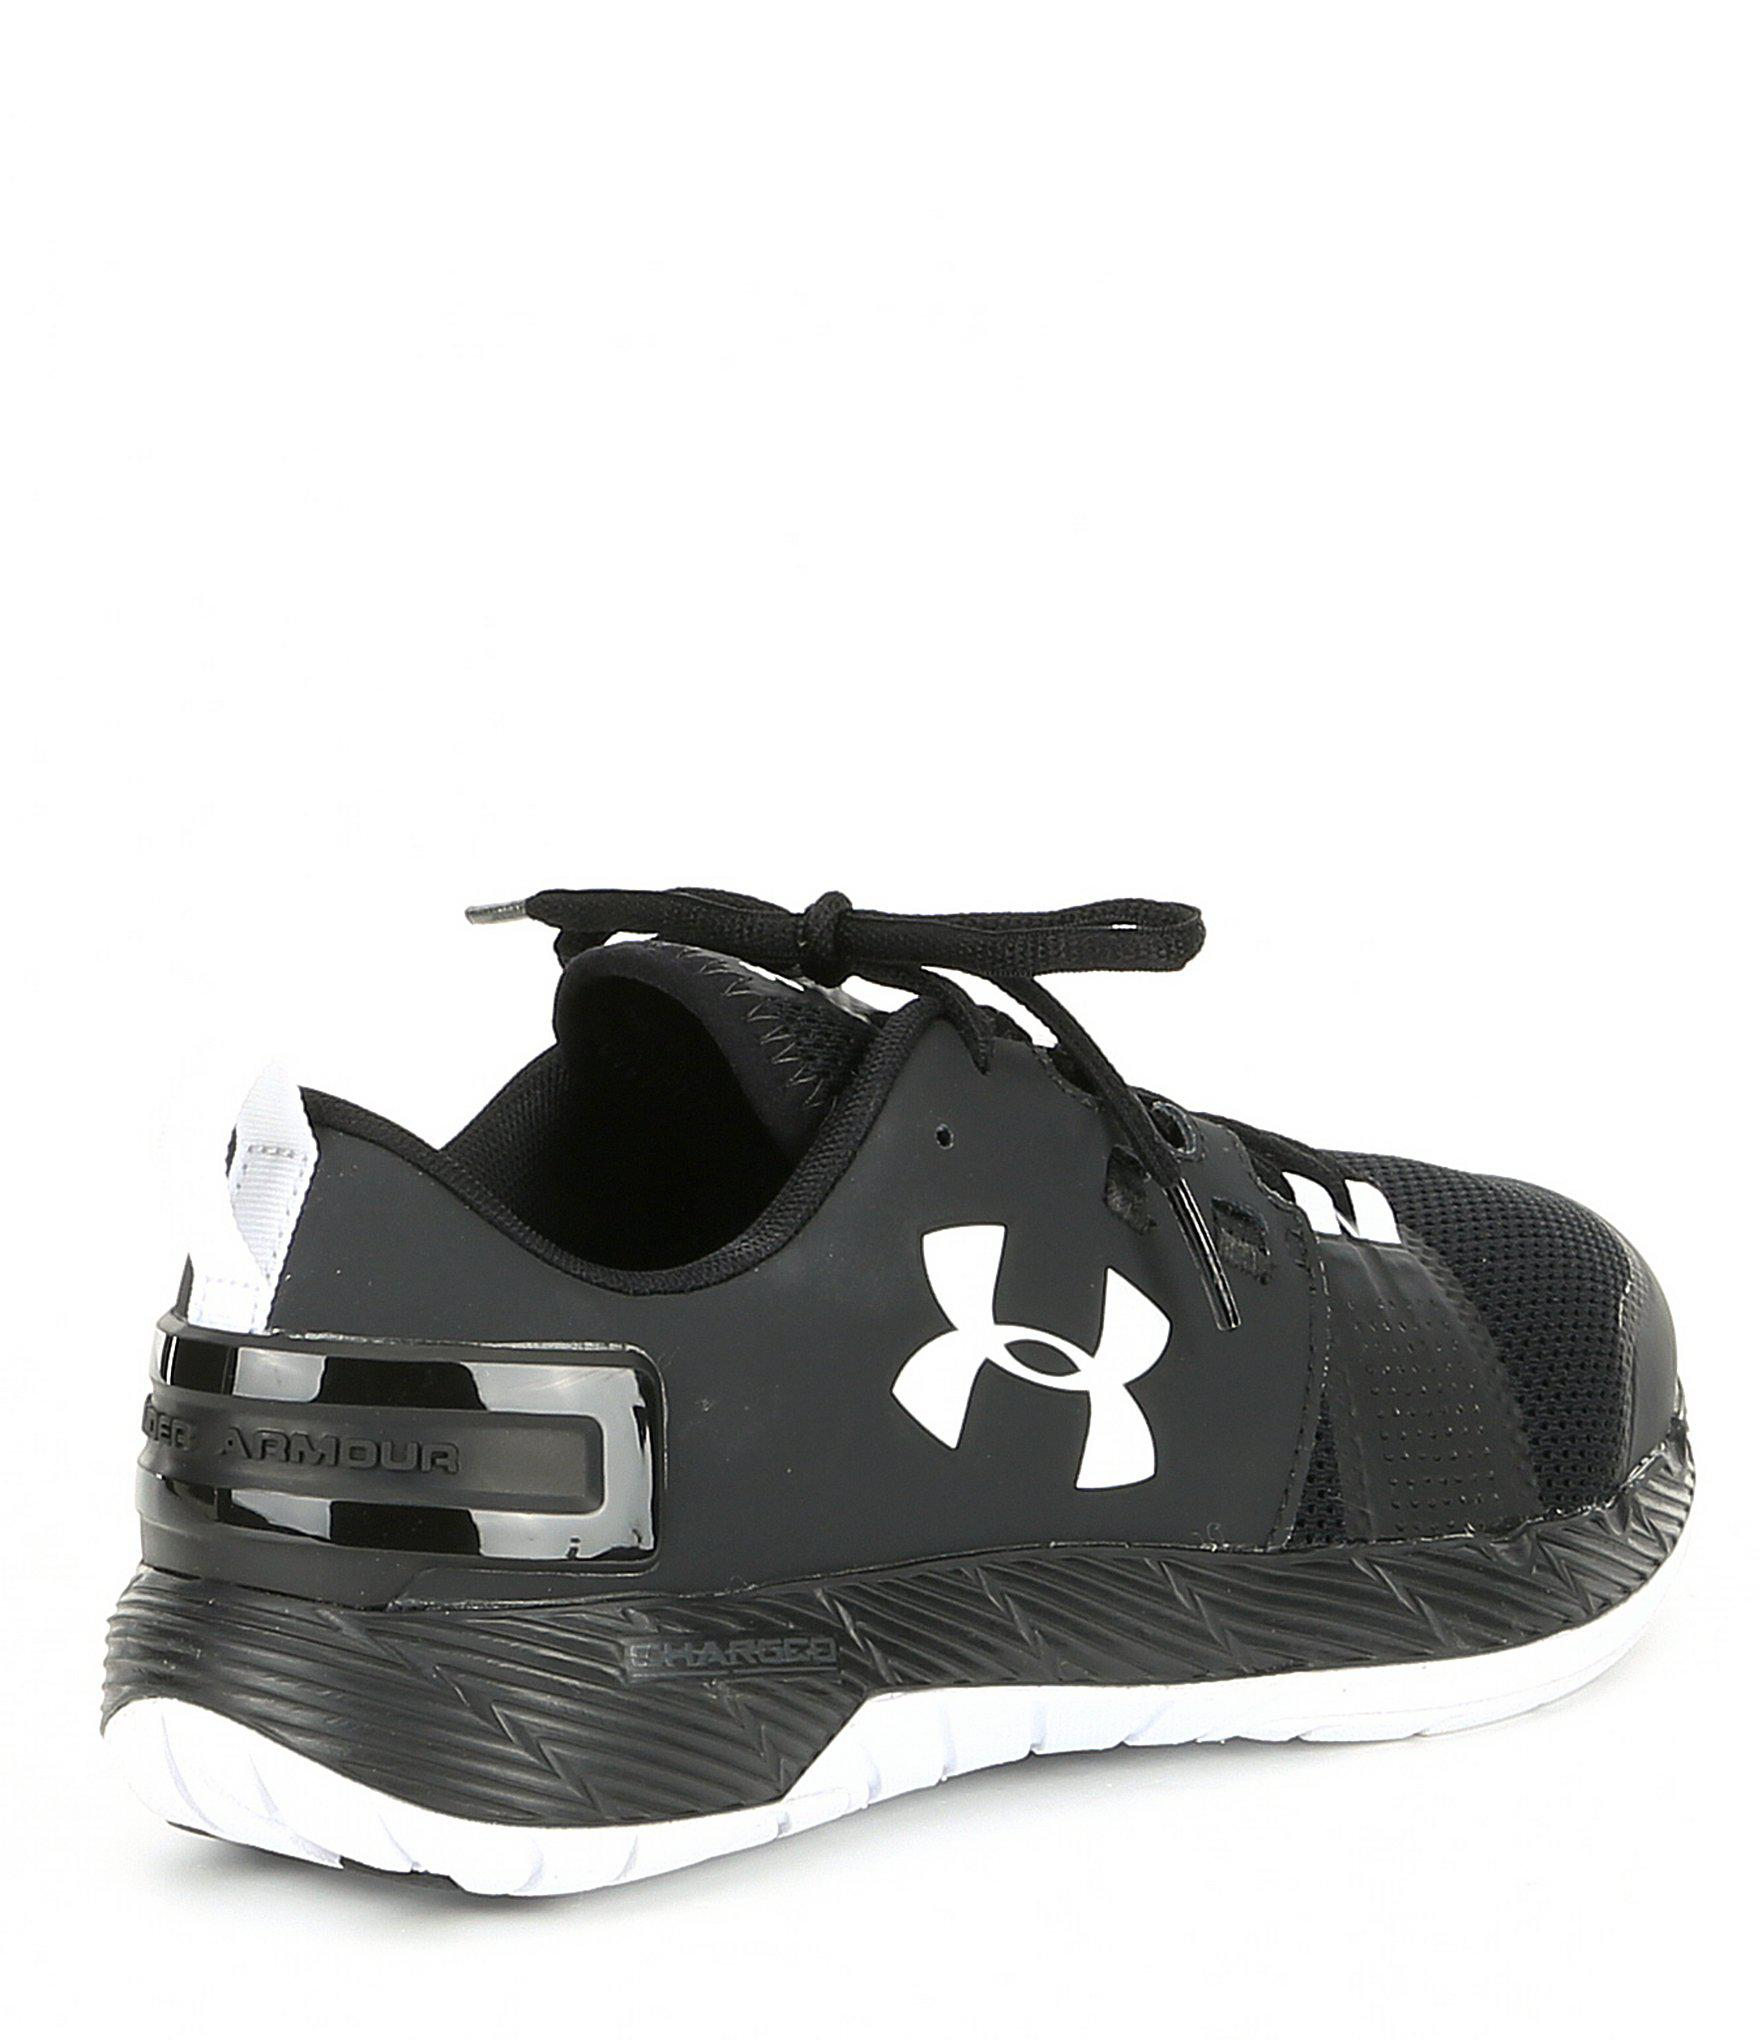 f1b8b4ac Under Armour Black Men's Commit Tr X Nm Training Shoe for men